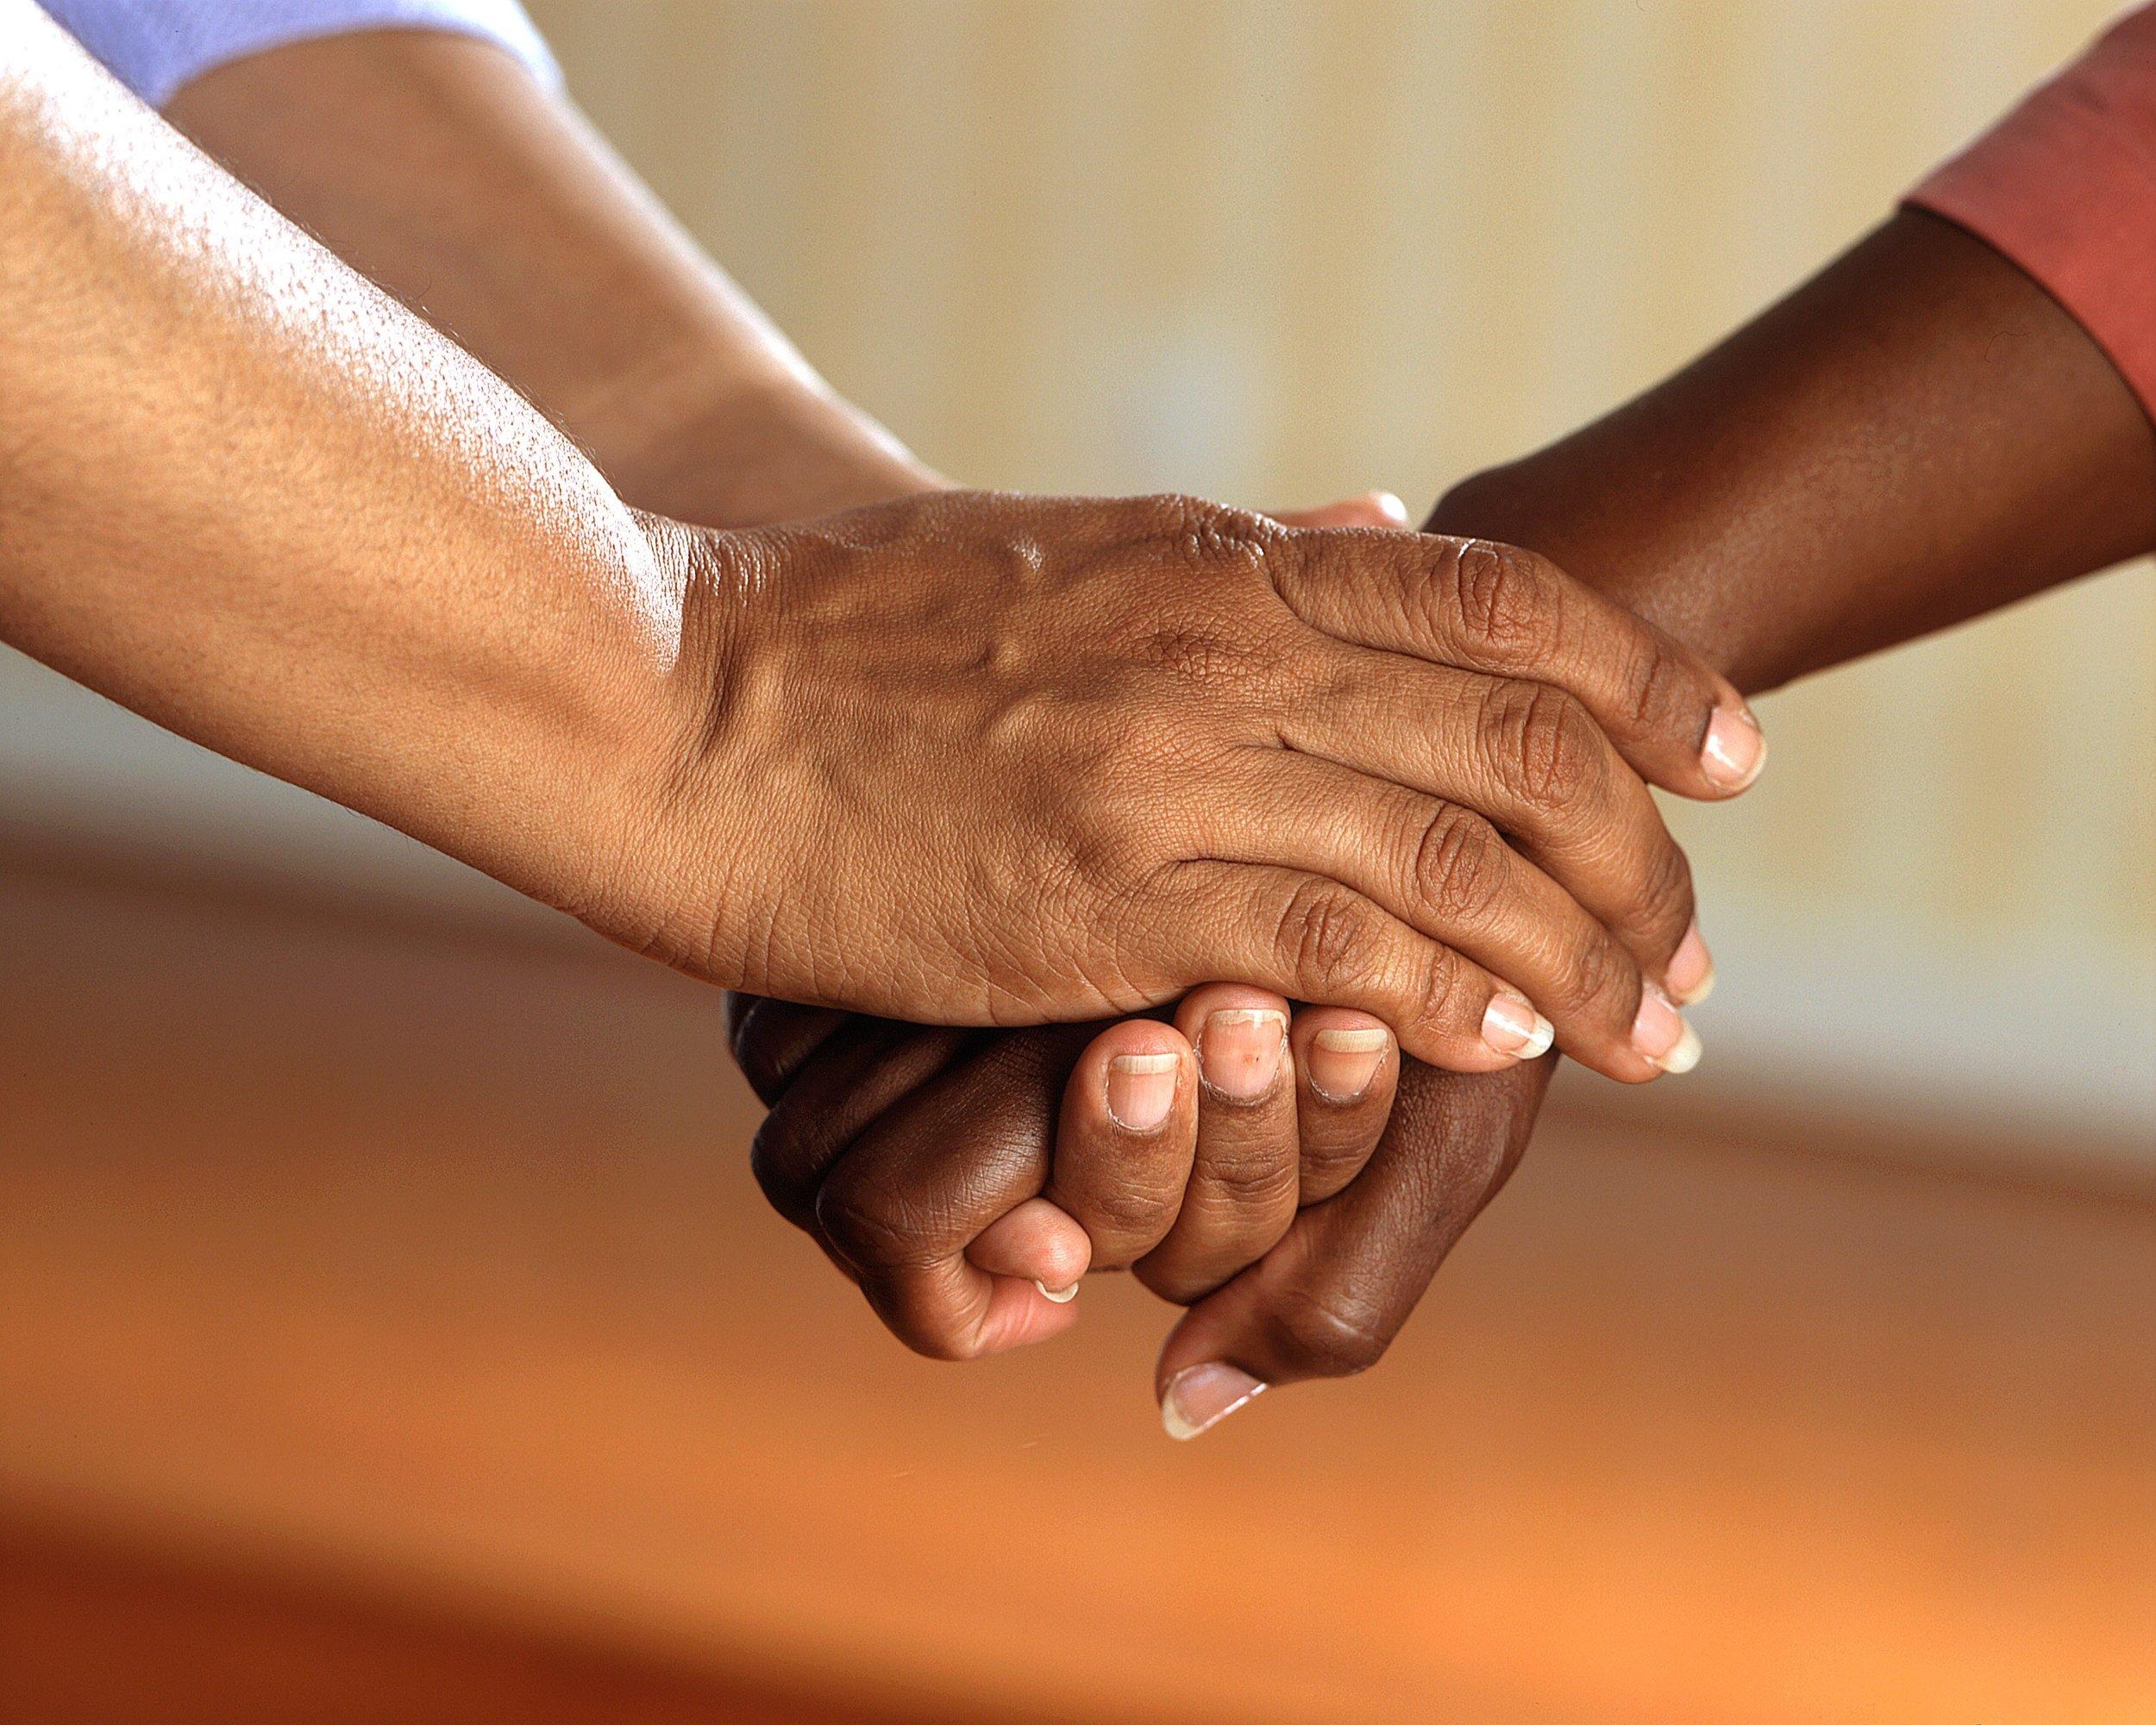 care-deal-hand-45842.jpg